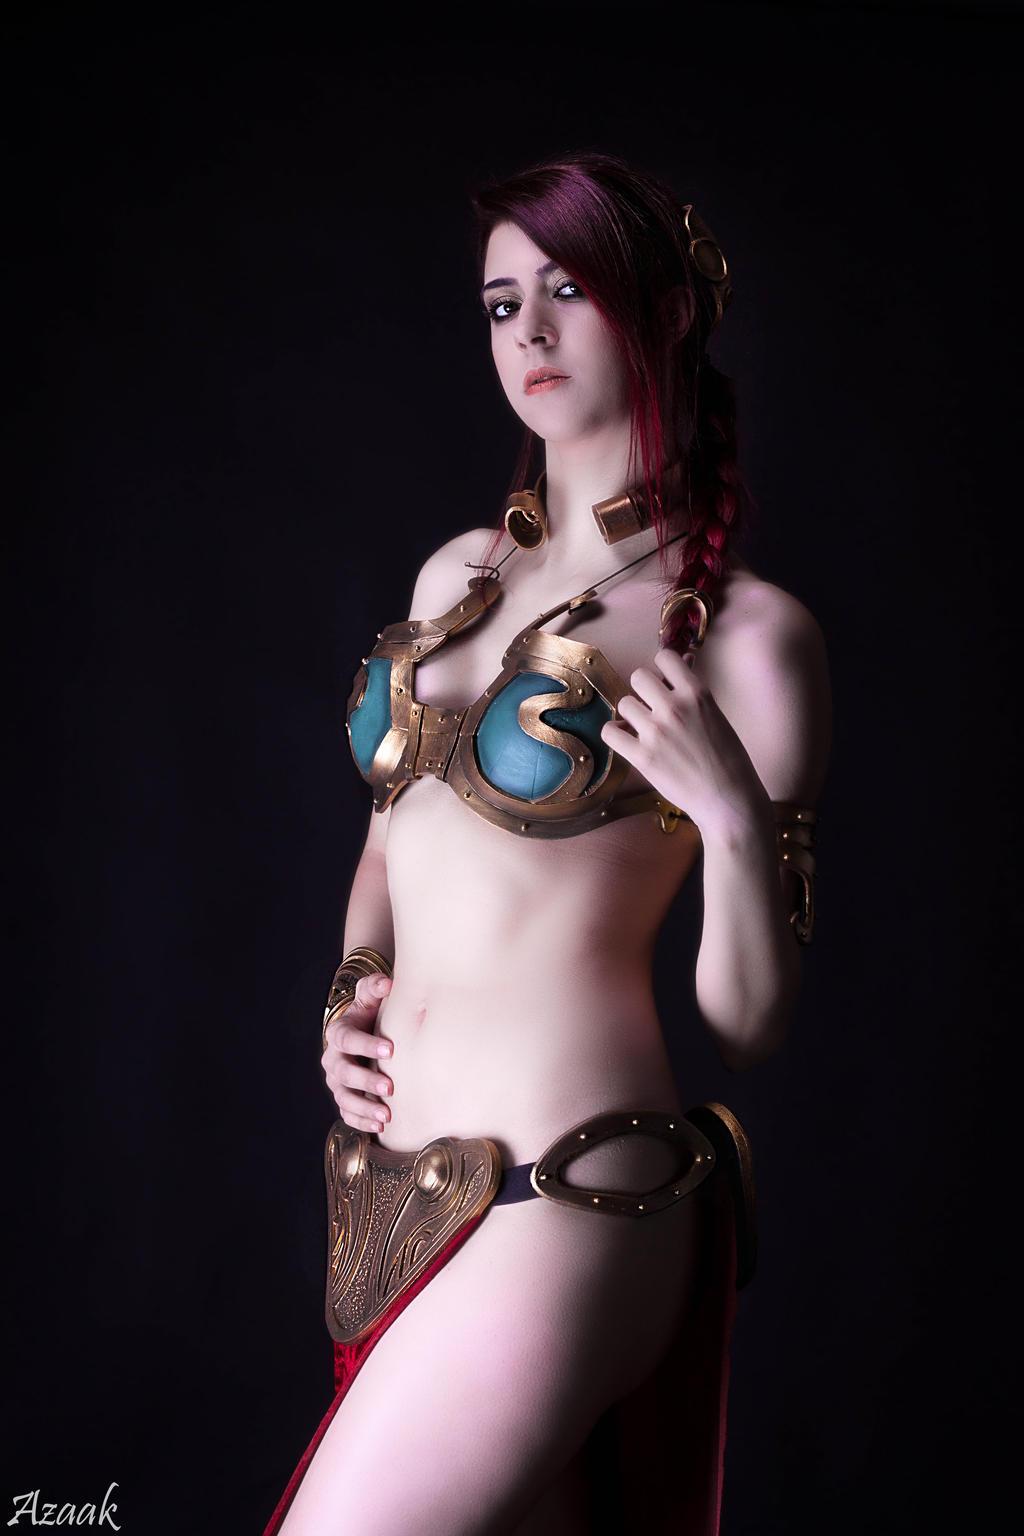 Amateur slave leia star wars cosplay blowjob amp cim - 2 part 8